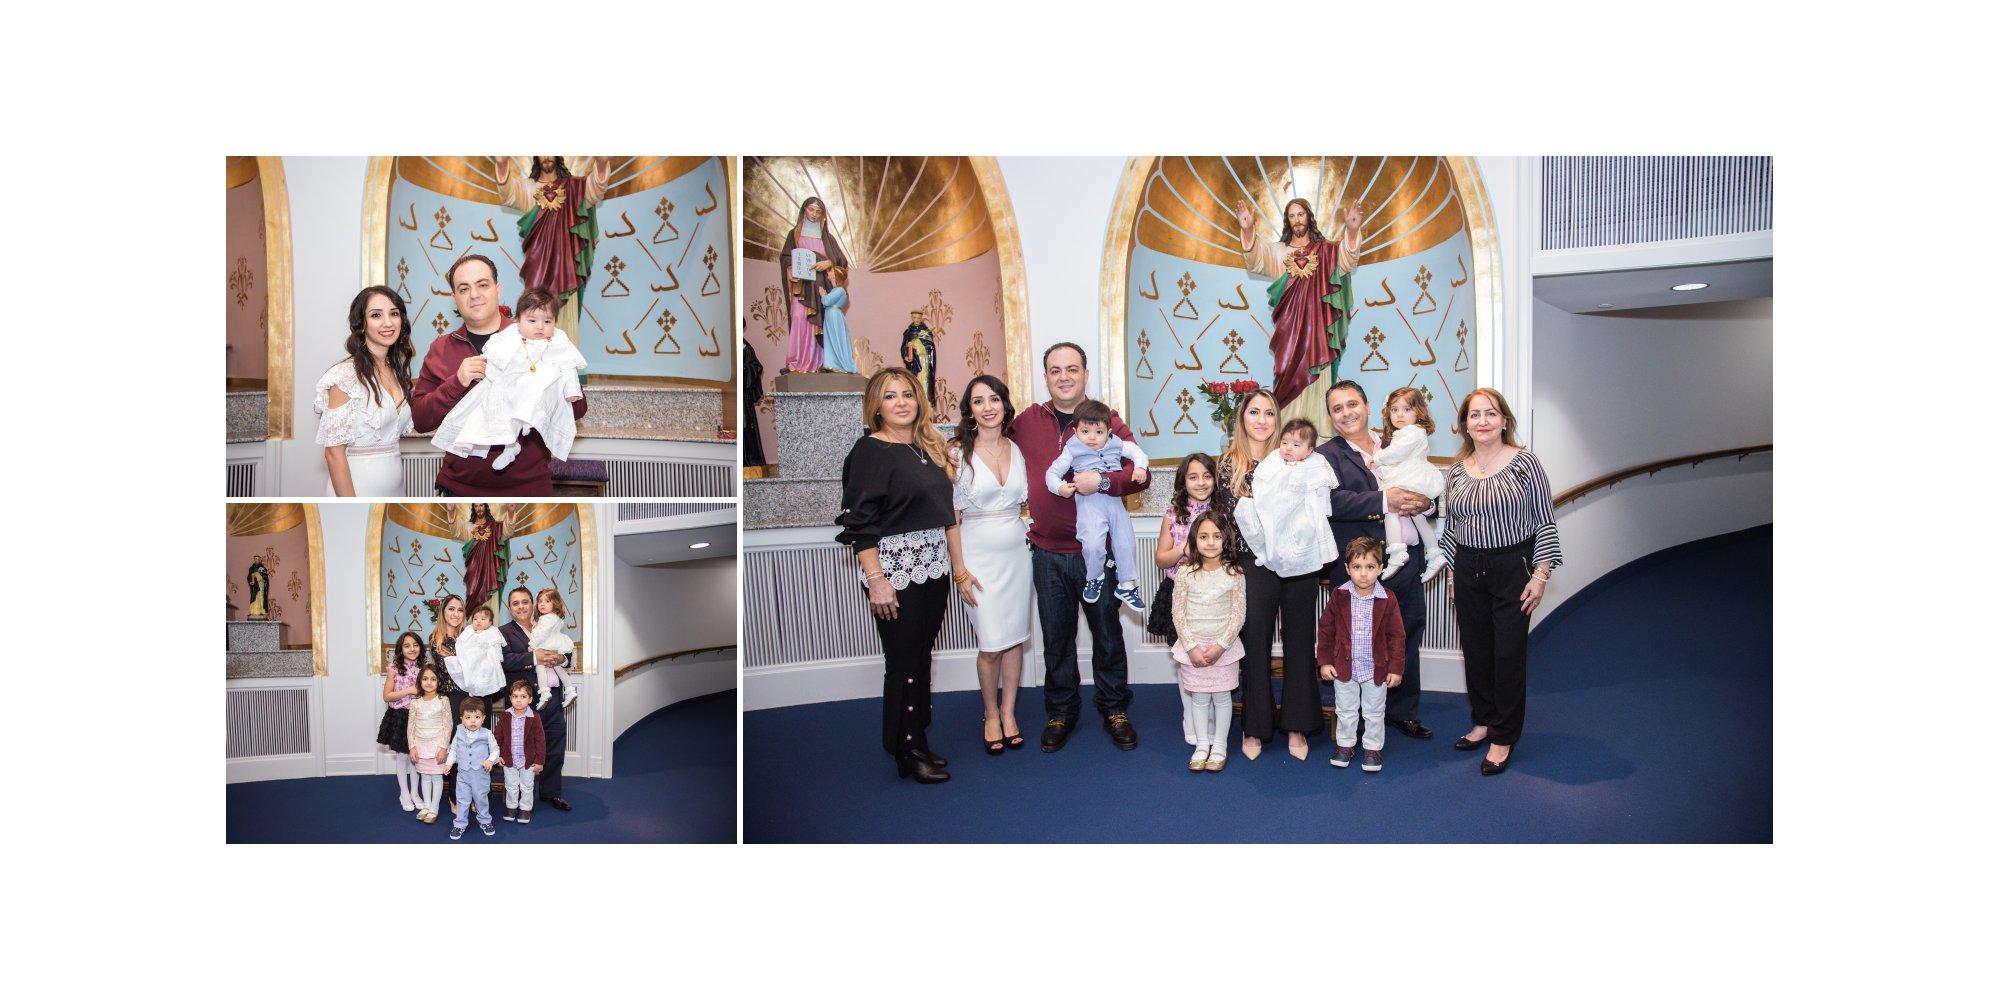 michigan-photographer-religious-event.jpg